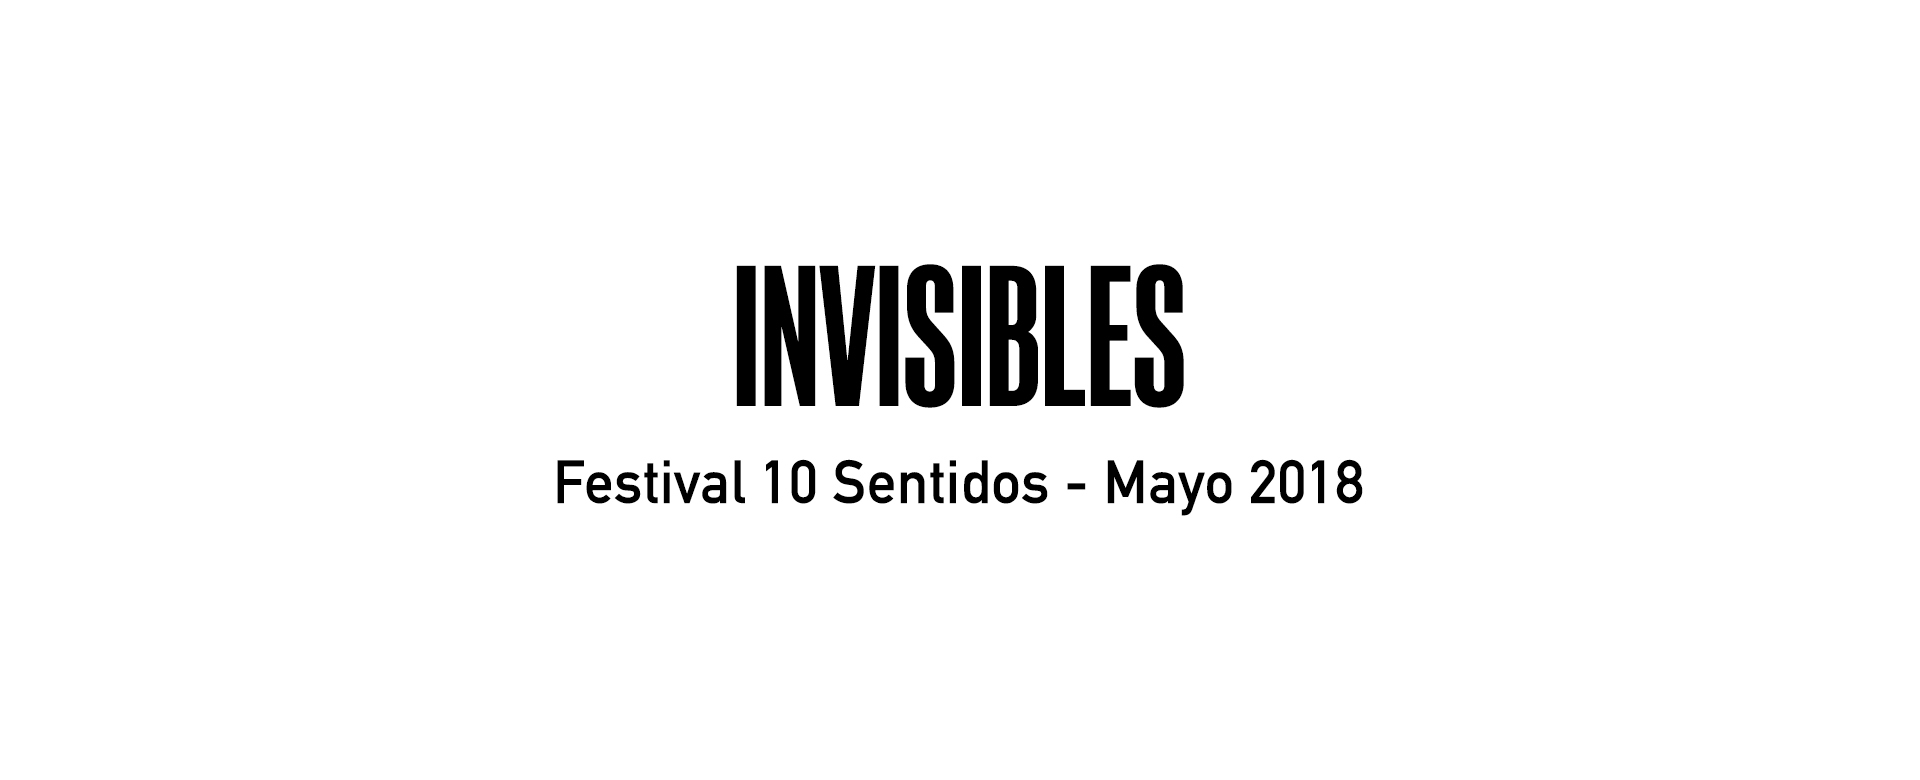 Lema Invisibles